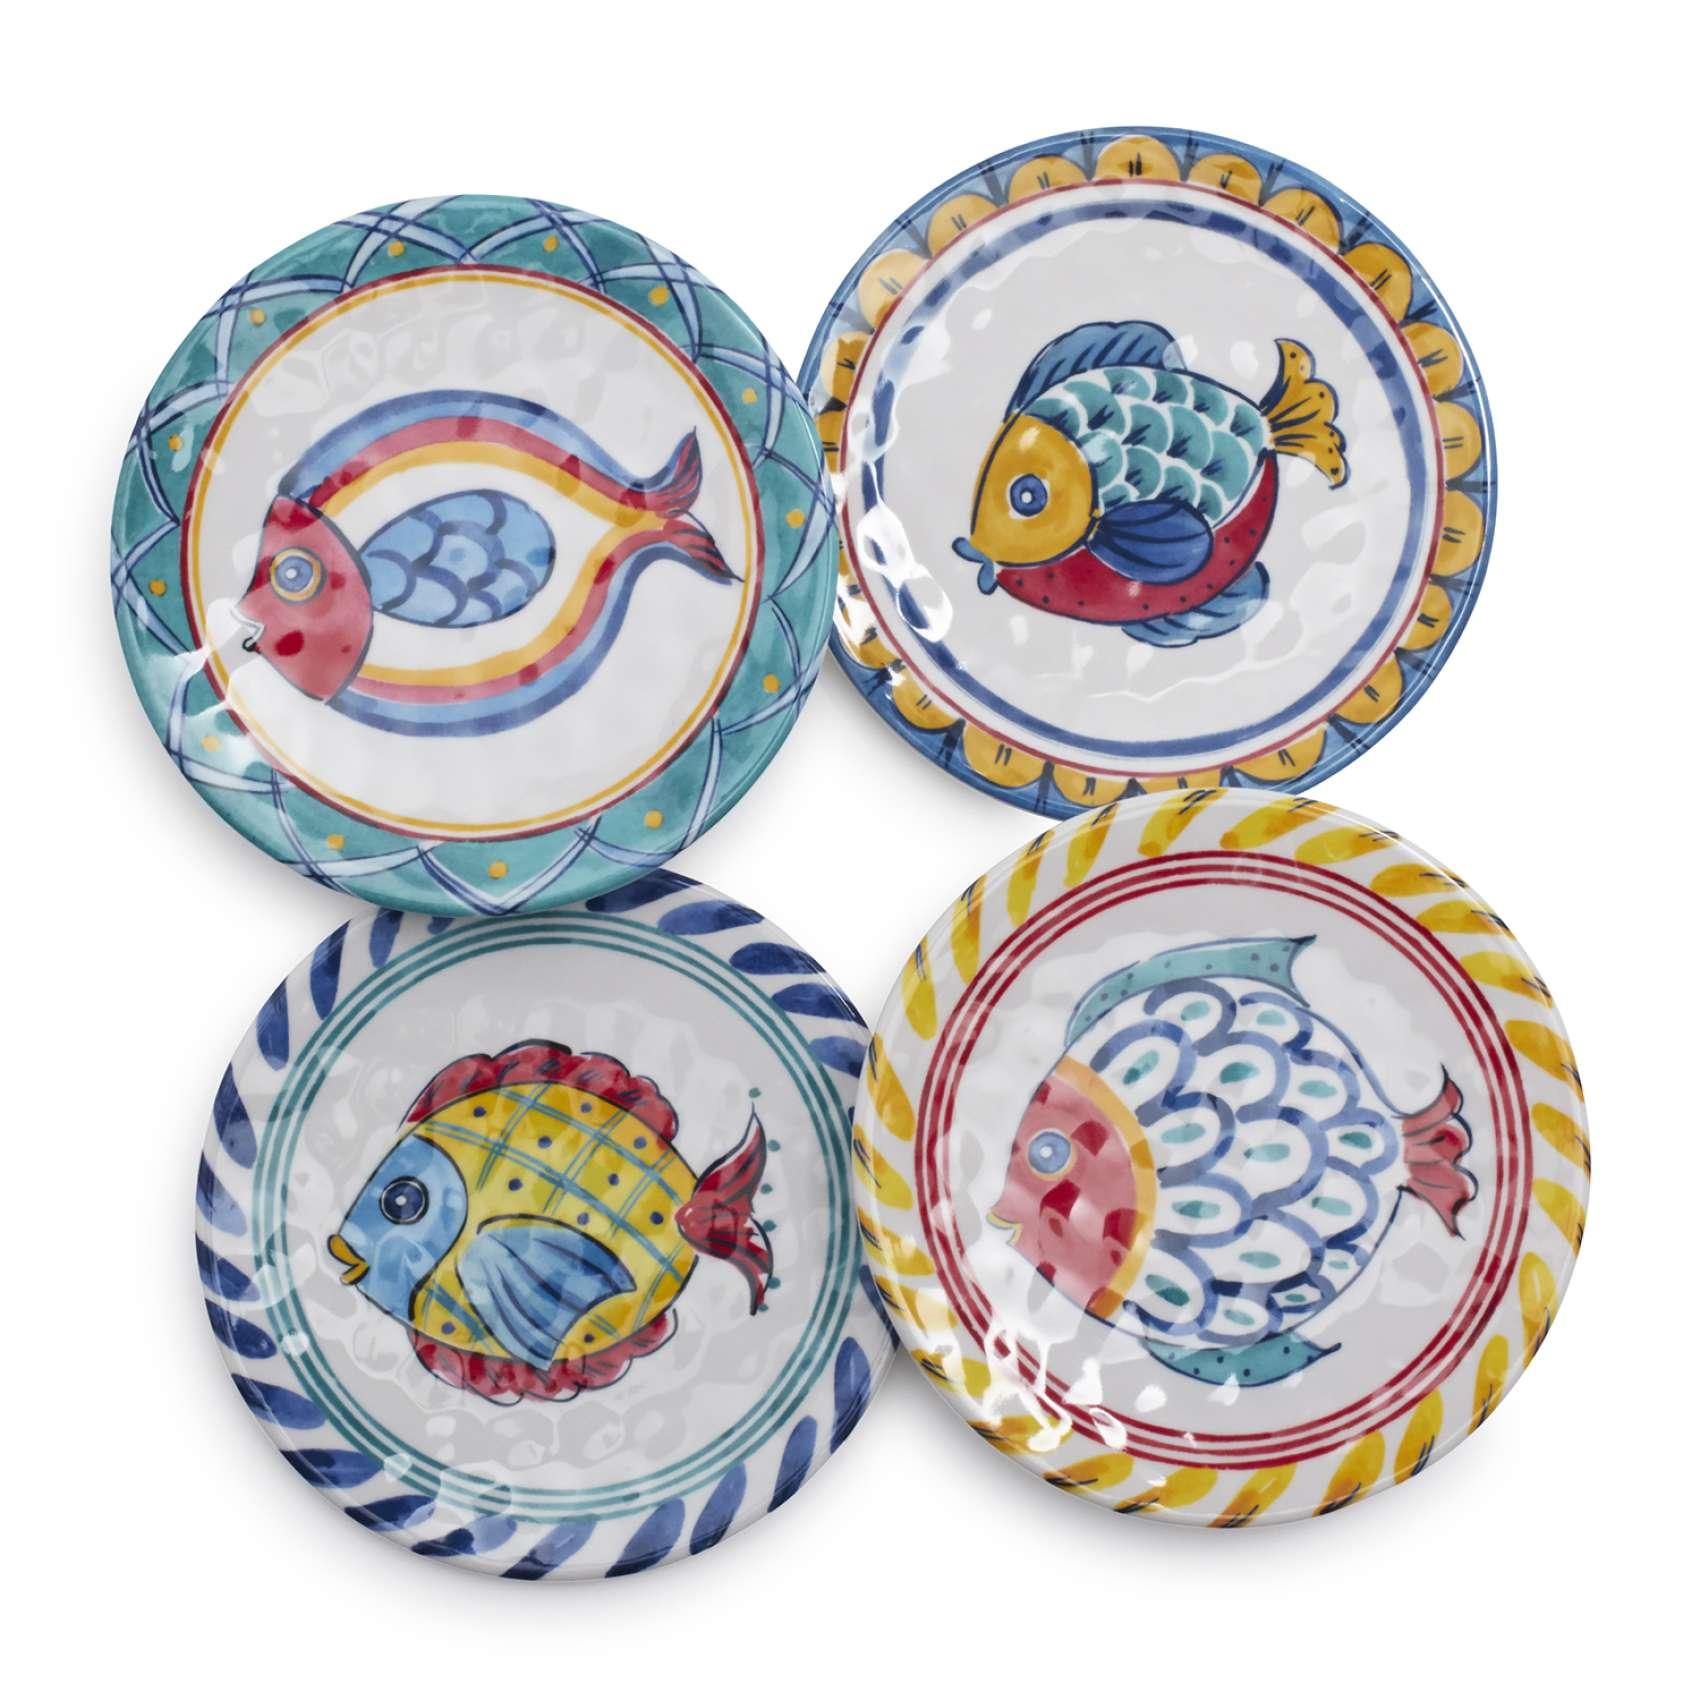 Positano Fish Melamine Appetizer Plates